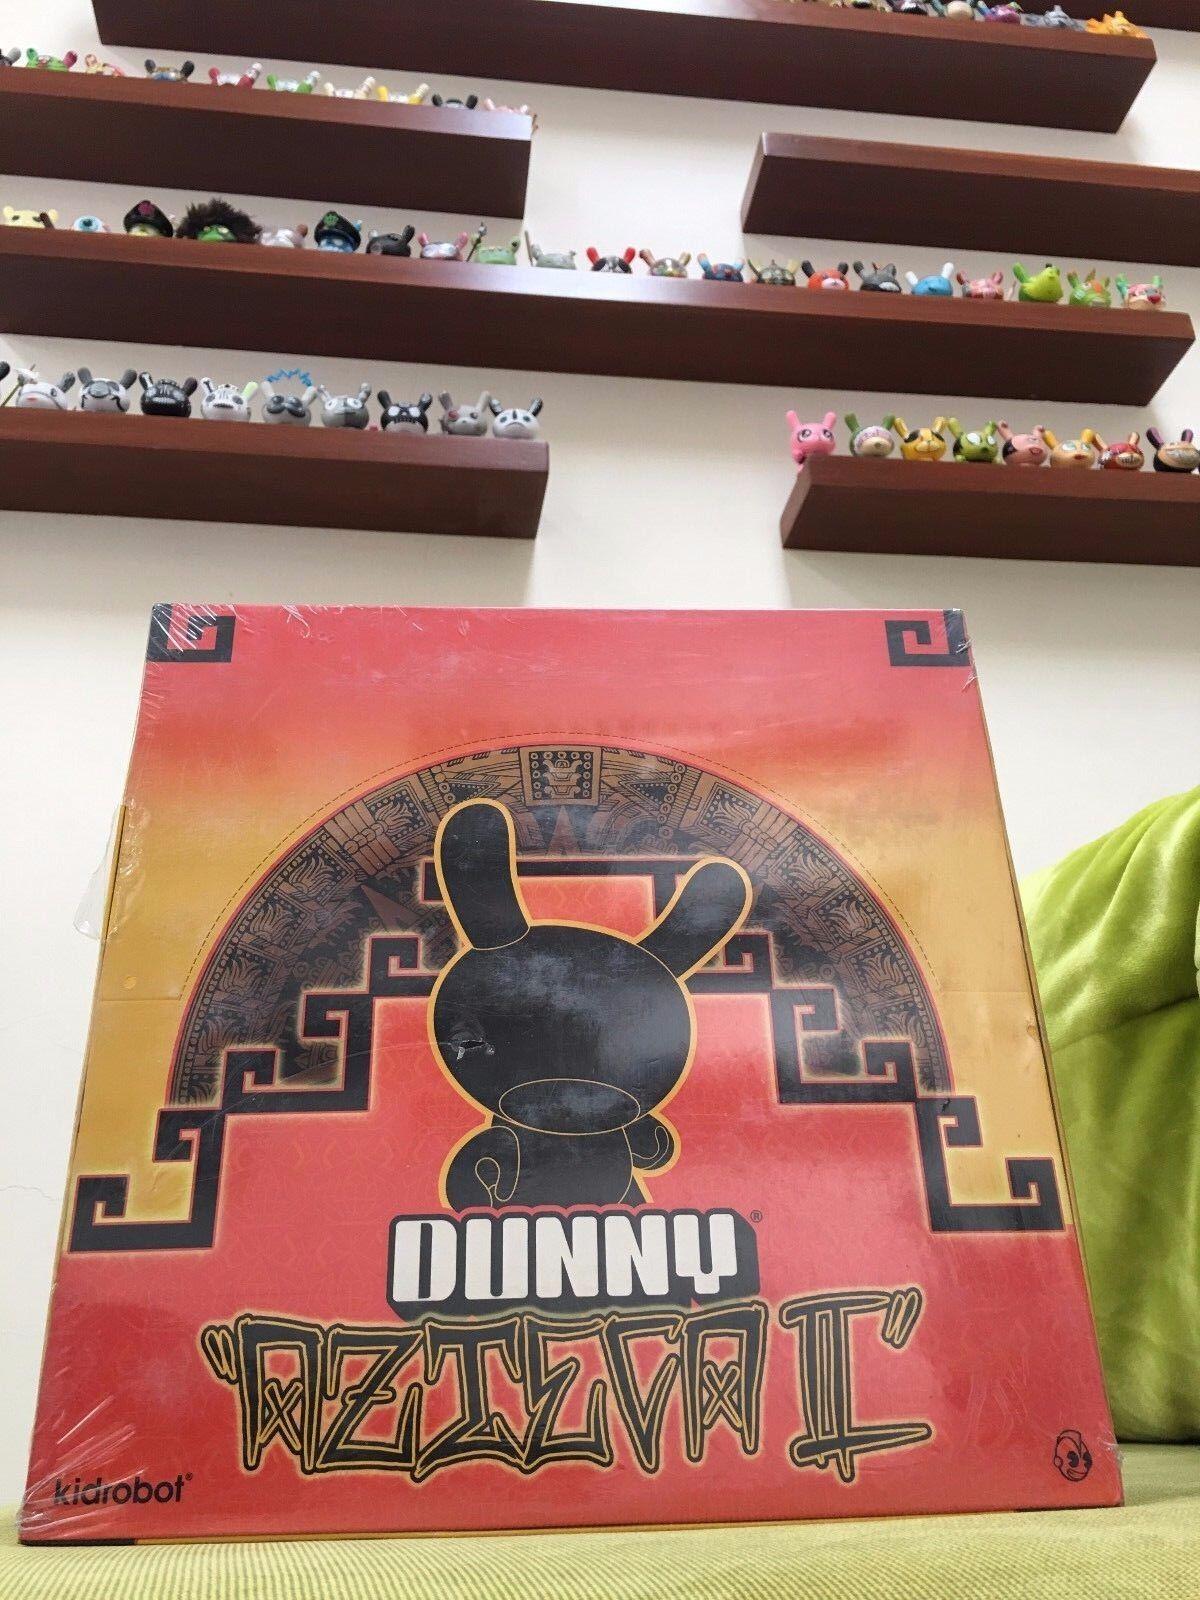 Kidrobot Dunny Azteca 2 series sealed case